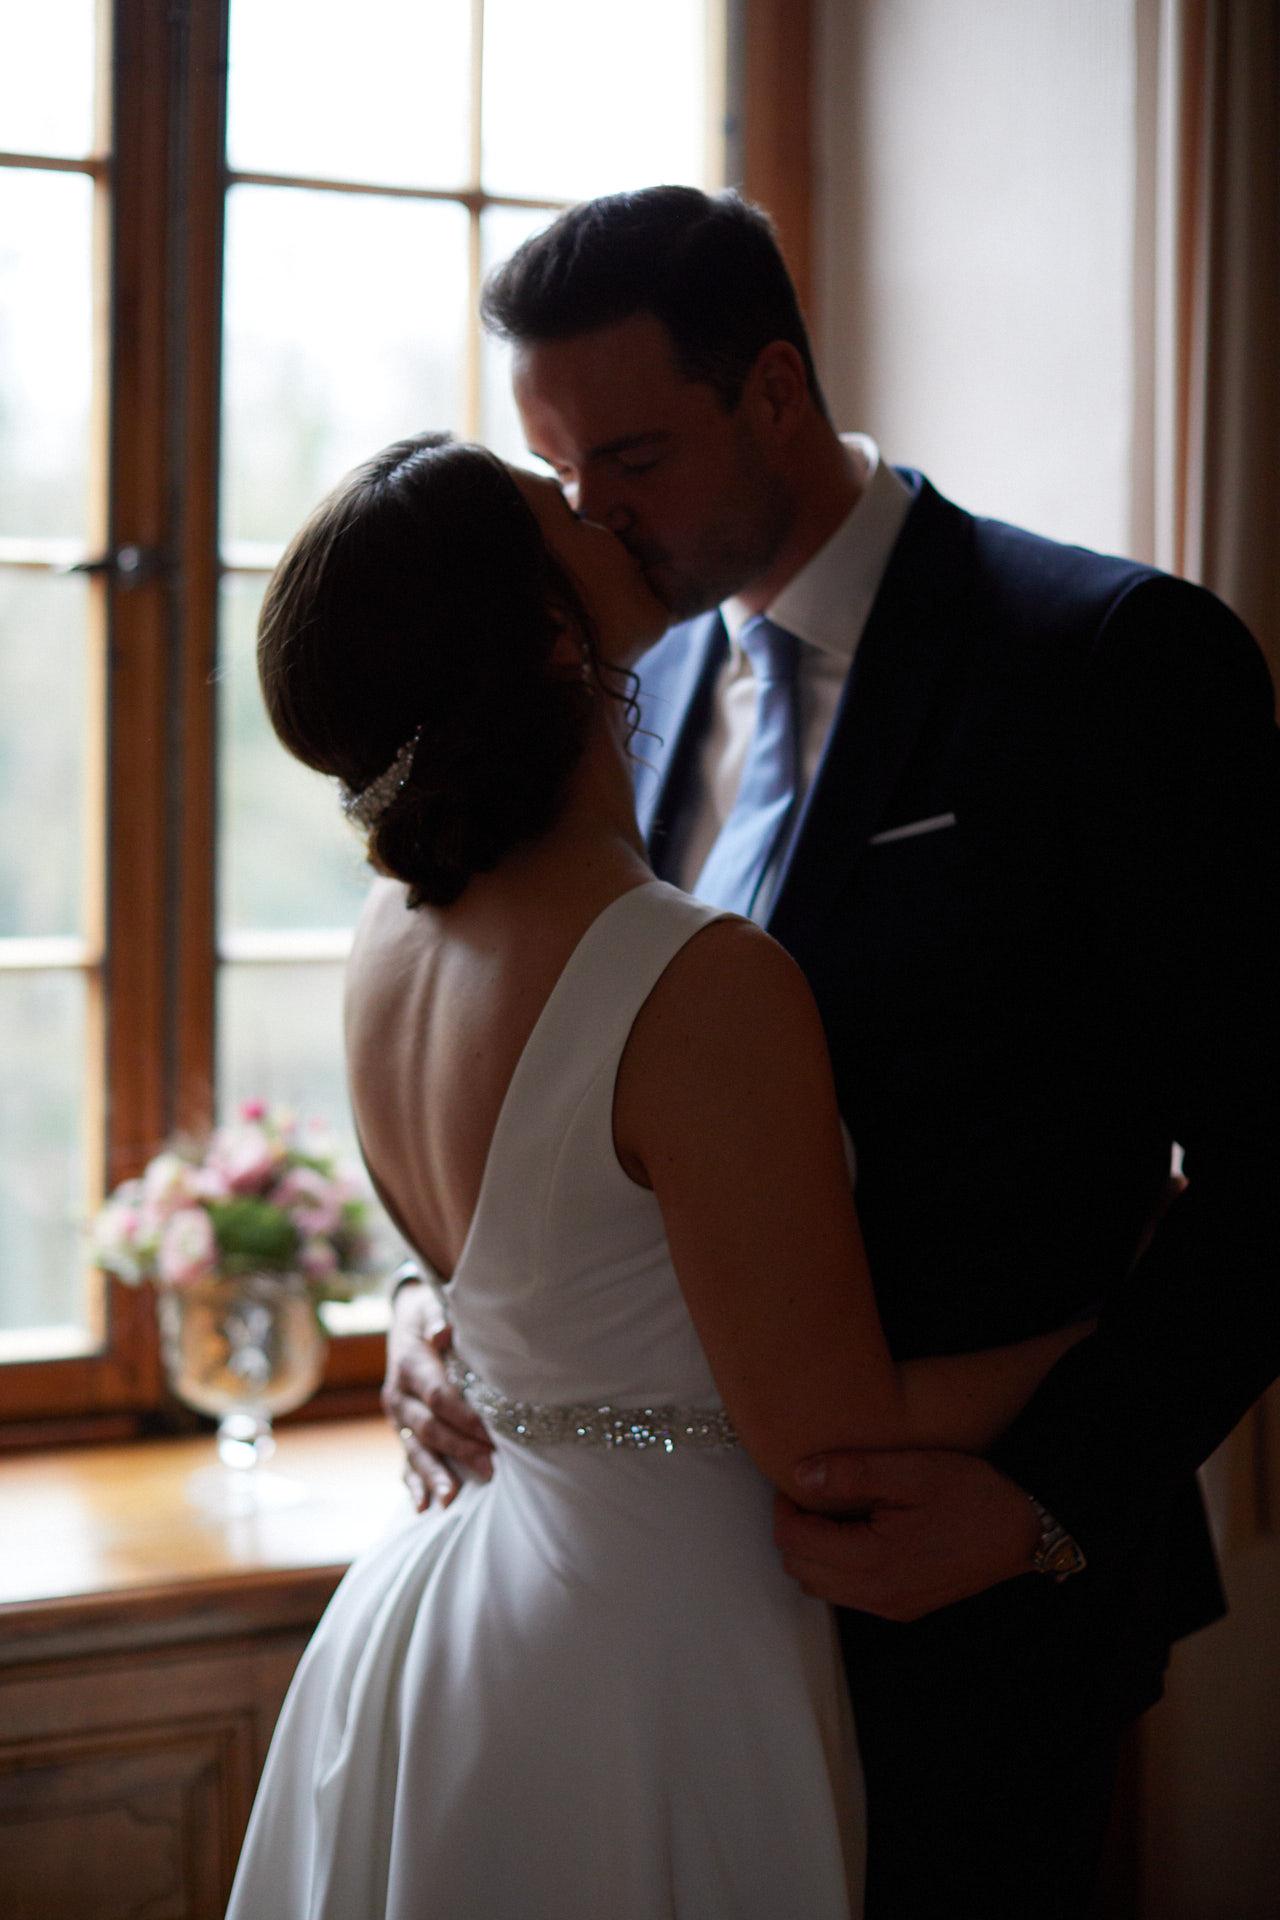 2019-12-20 Laura & Robin - Alena and Daniel Weddings 0218 1